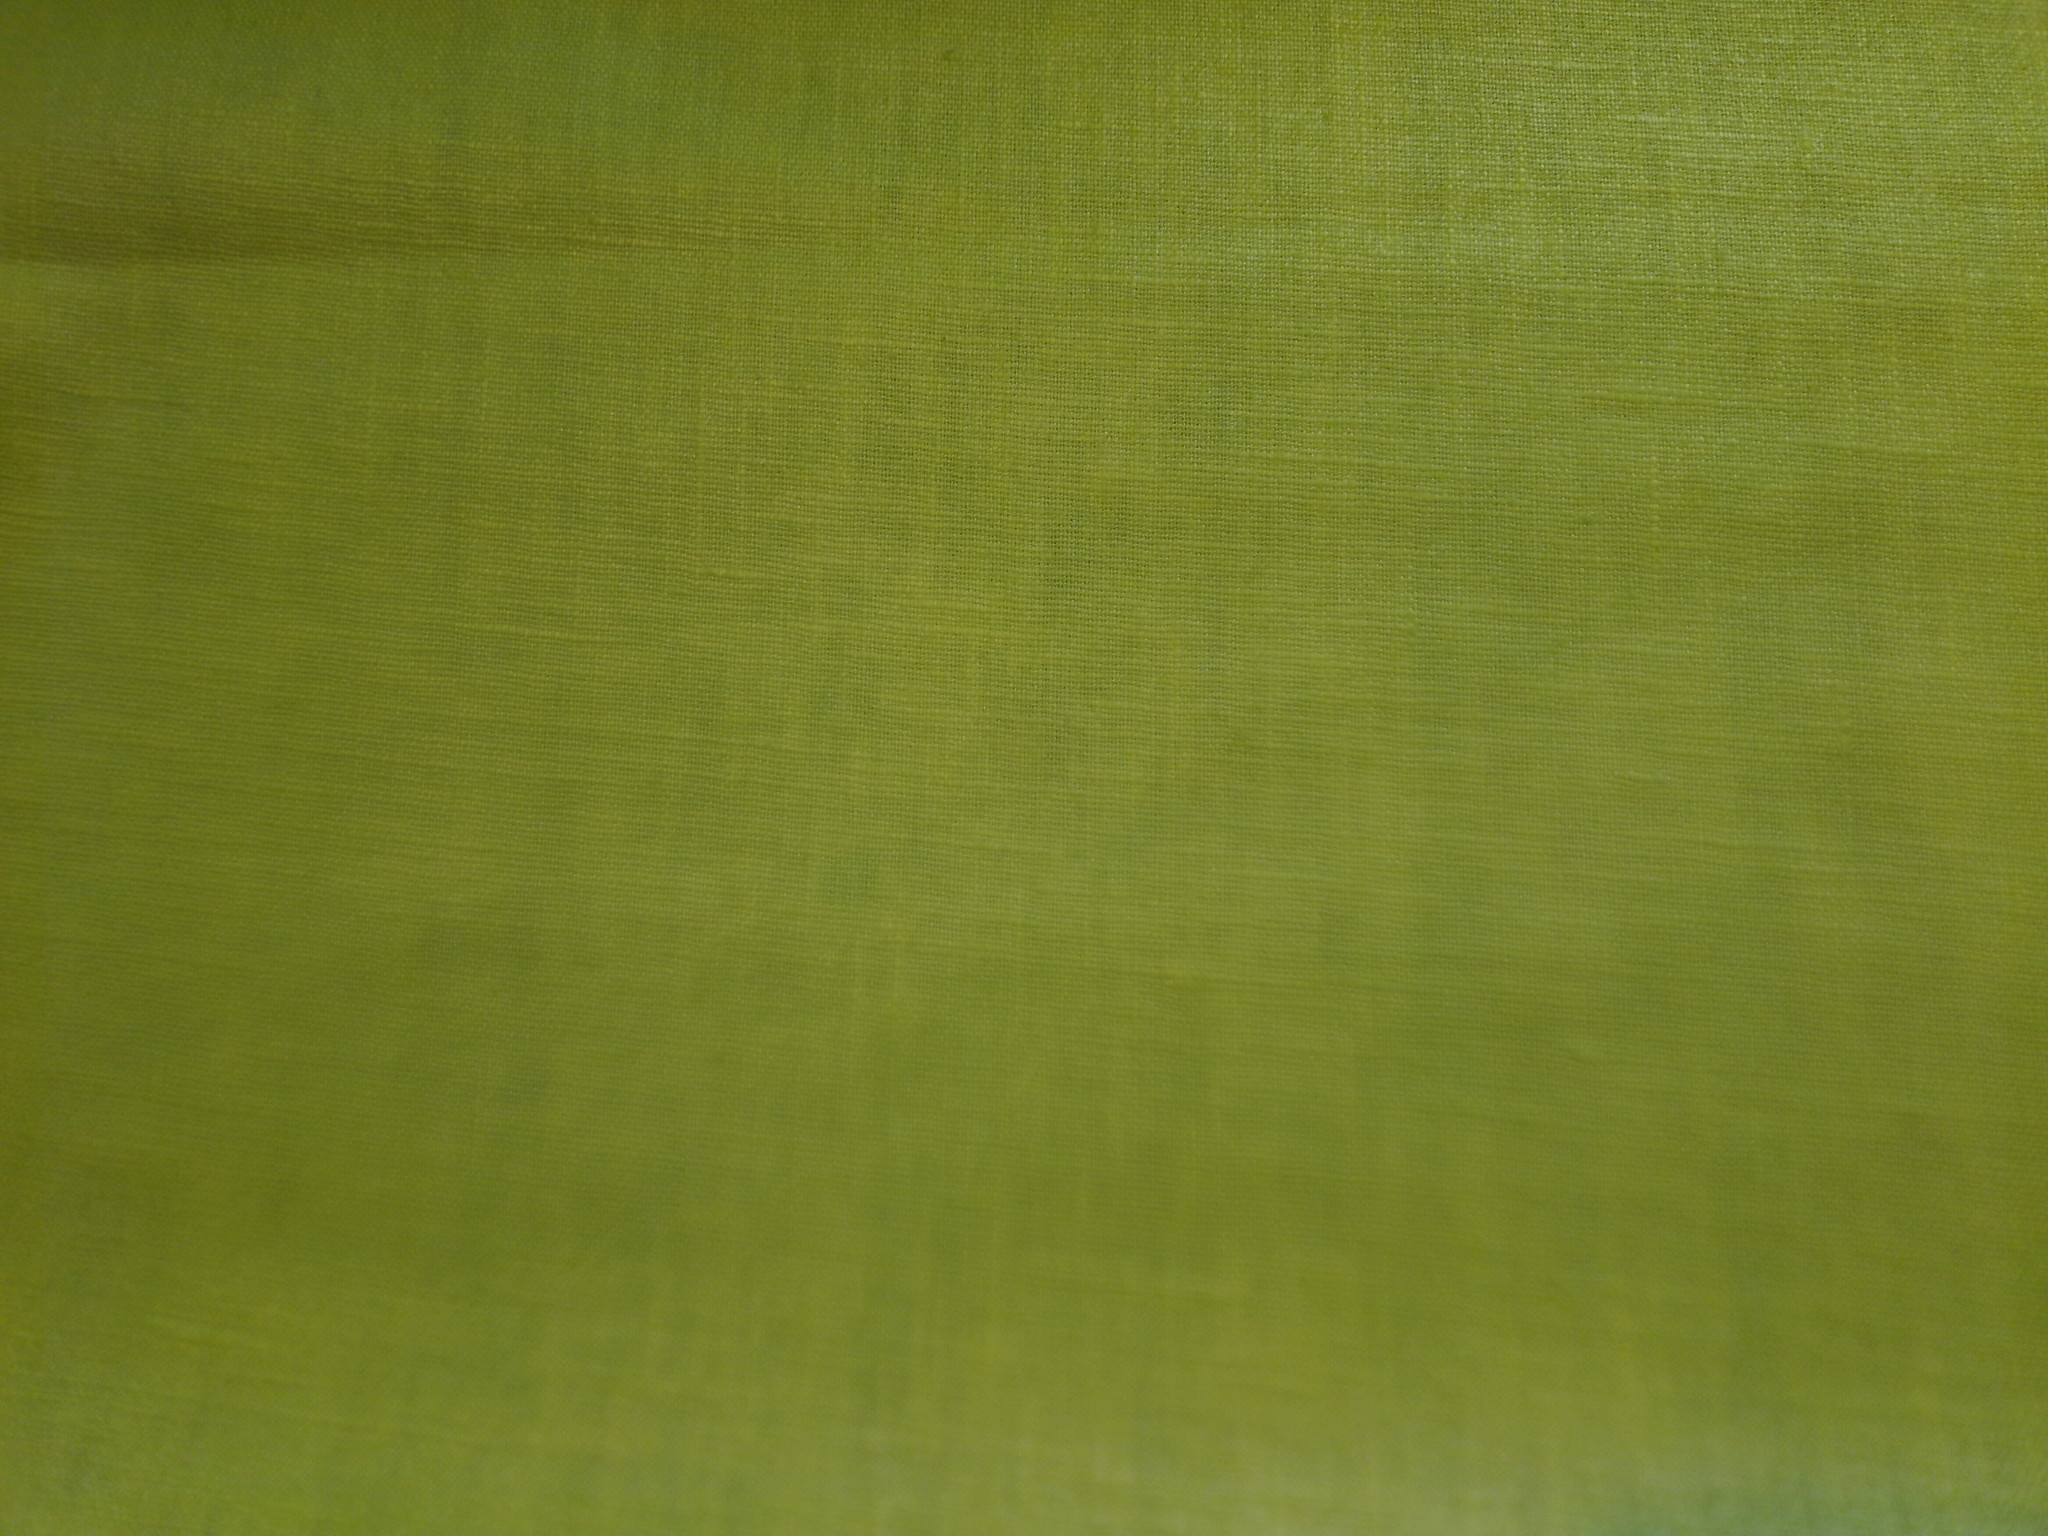 "Le grenier du lin aniseed green "" coated linen"